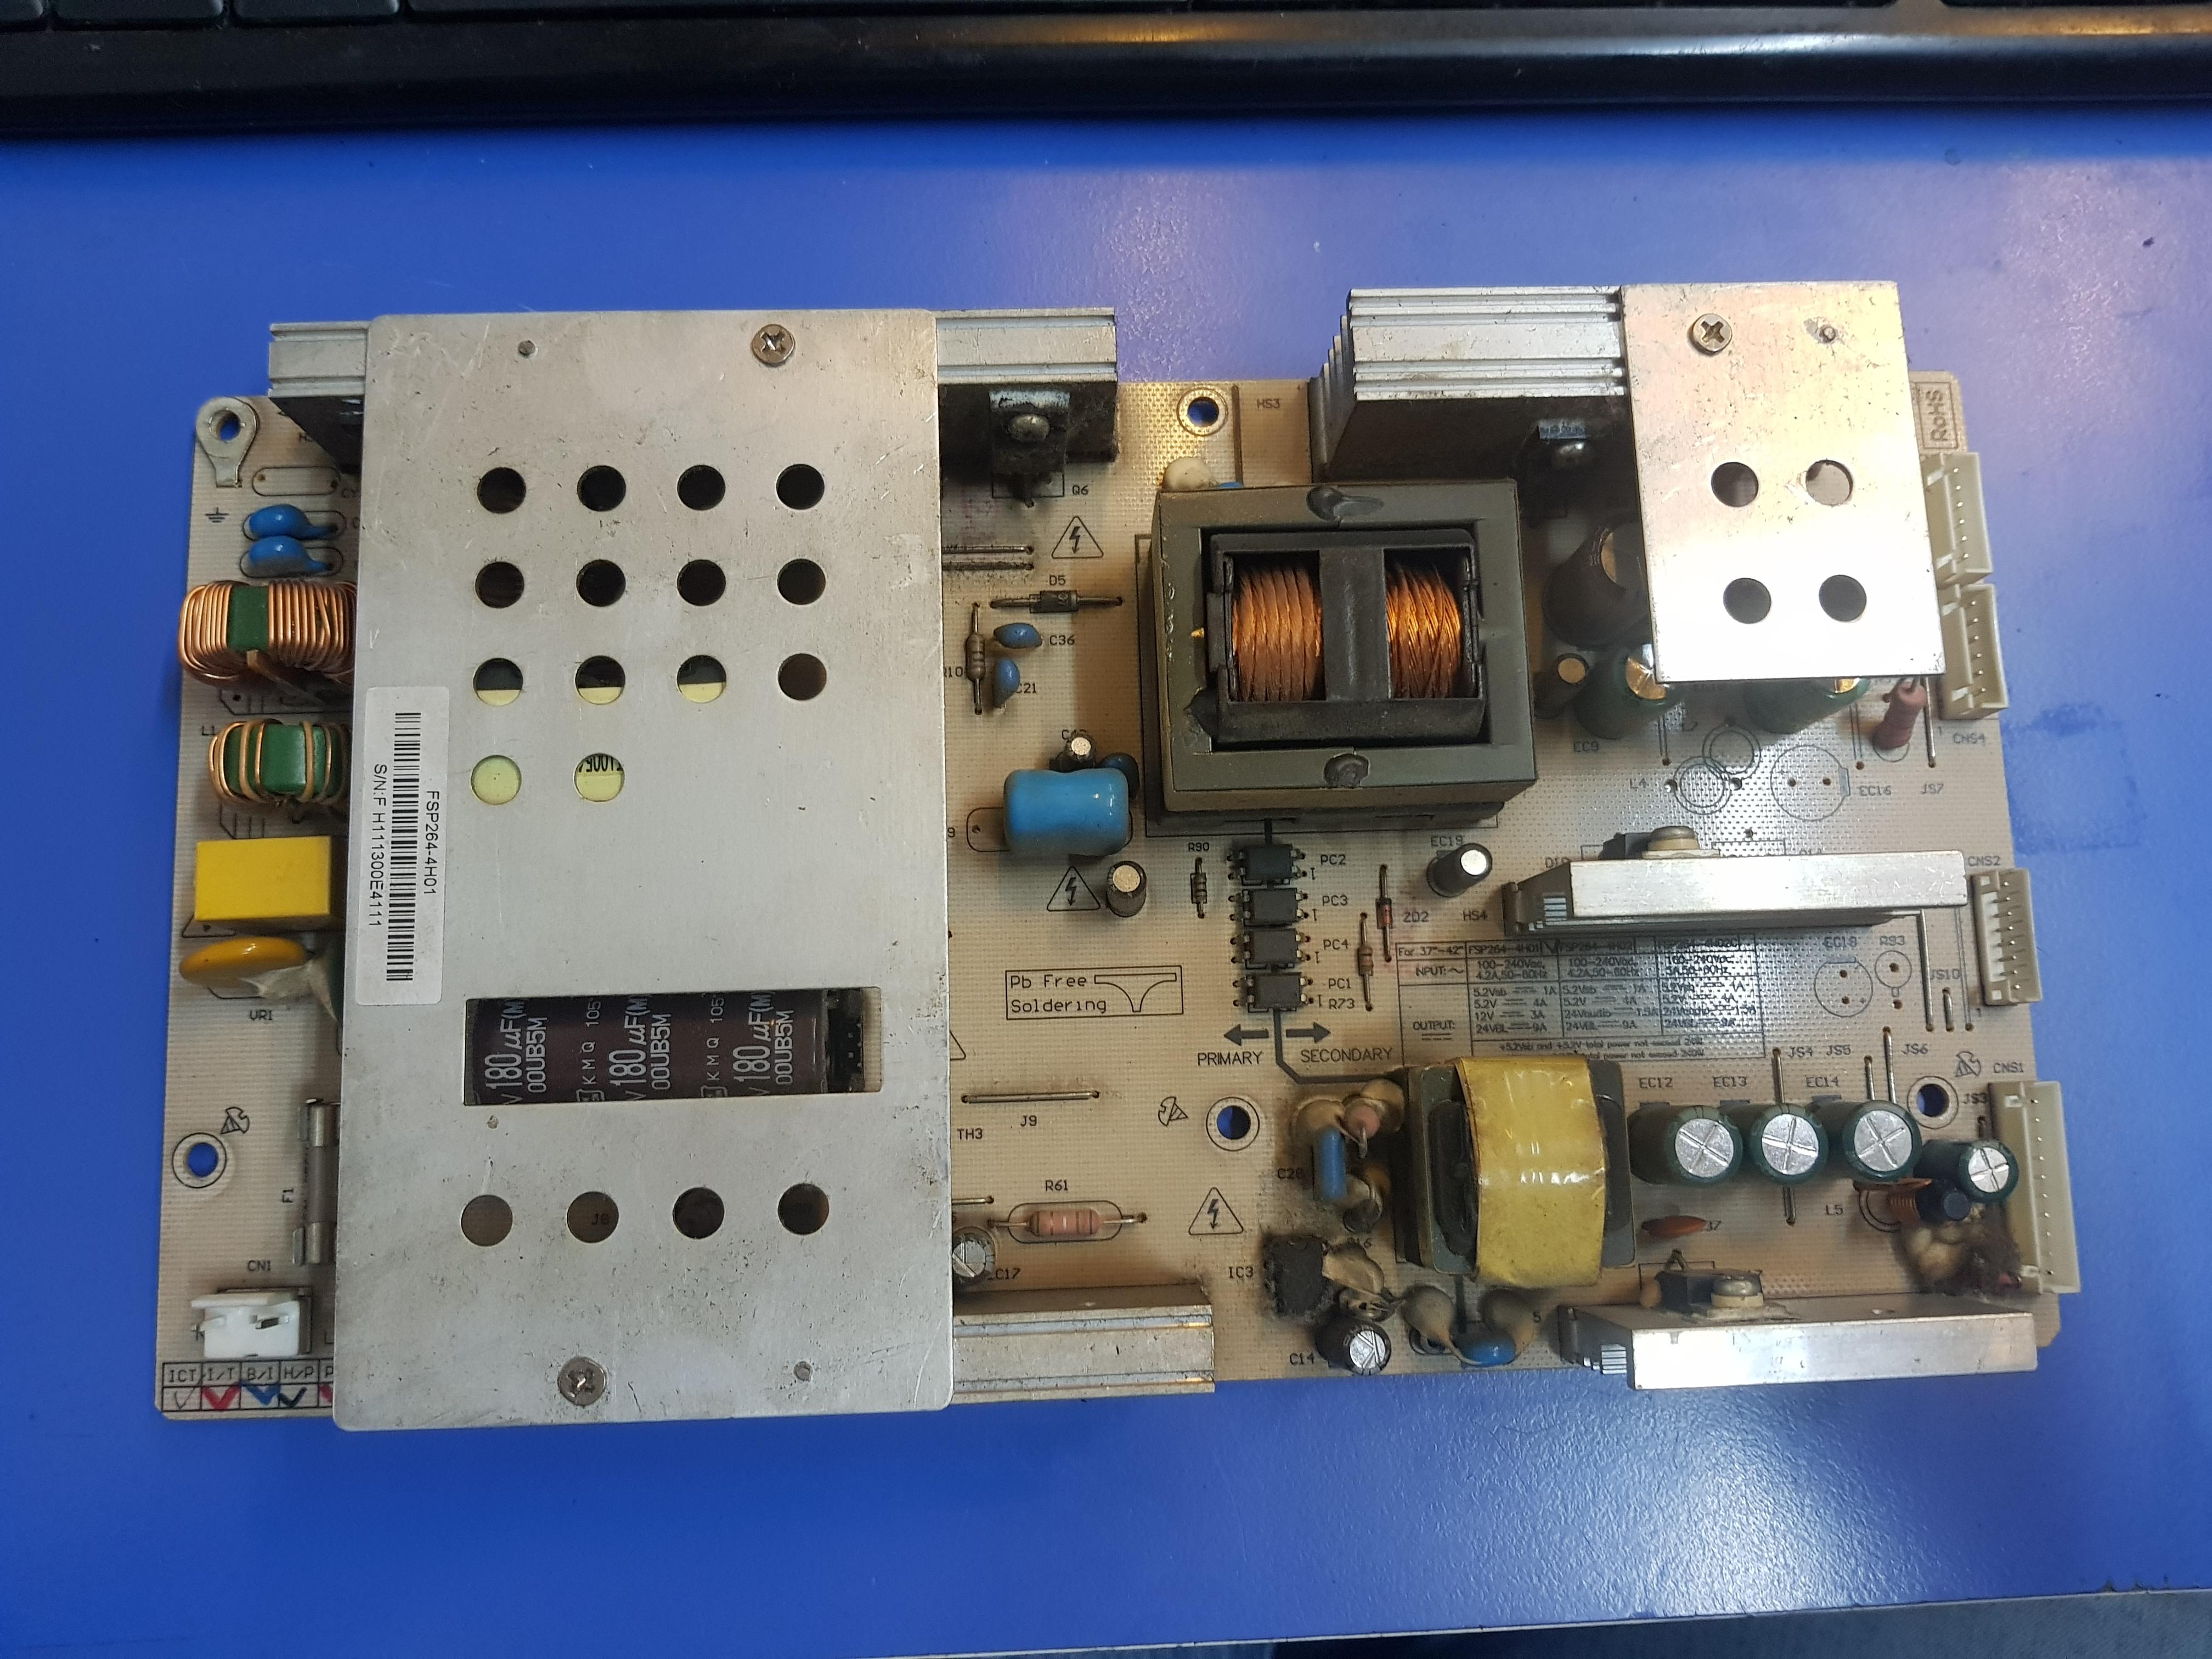 FSP264-4H01 FSP264-4H01, FSP264-4H02, 3BS0214116GP, LTA400HA07, Power Board, AXEN AX040LM8-T2M, AXEN AX040L06, SUNNY SN040LM8-7F, SUNNY SN040LM8-7F 40 LCD